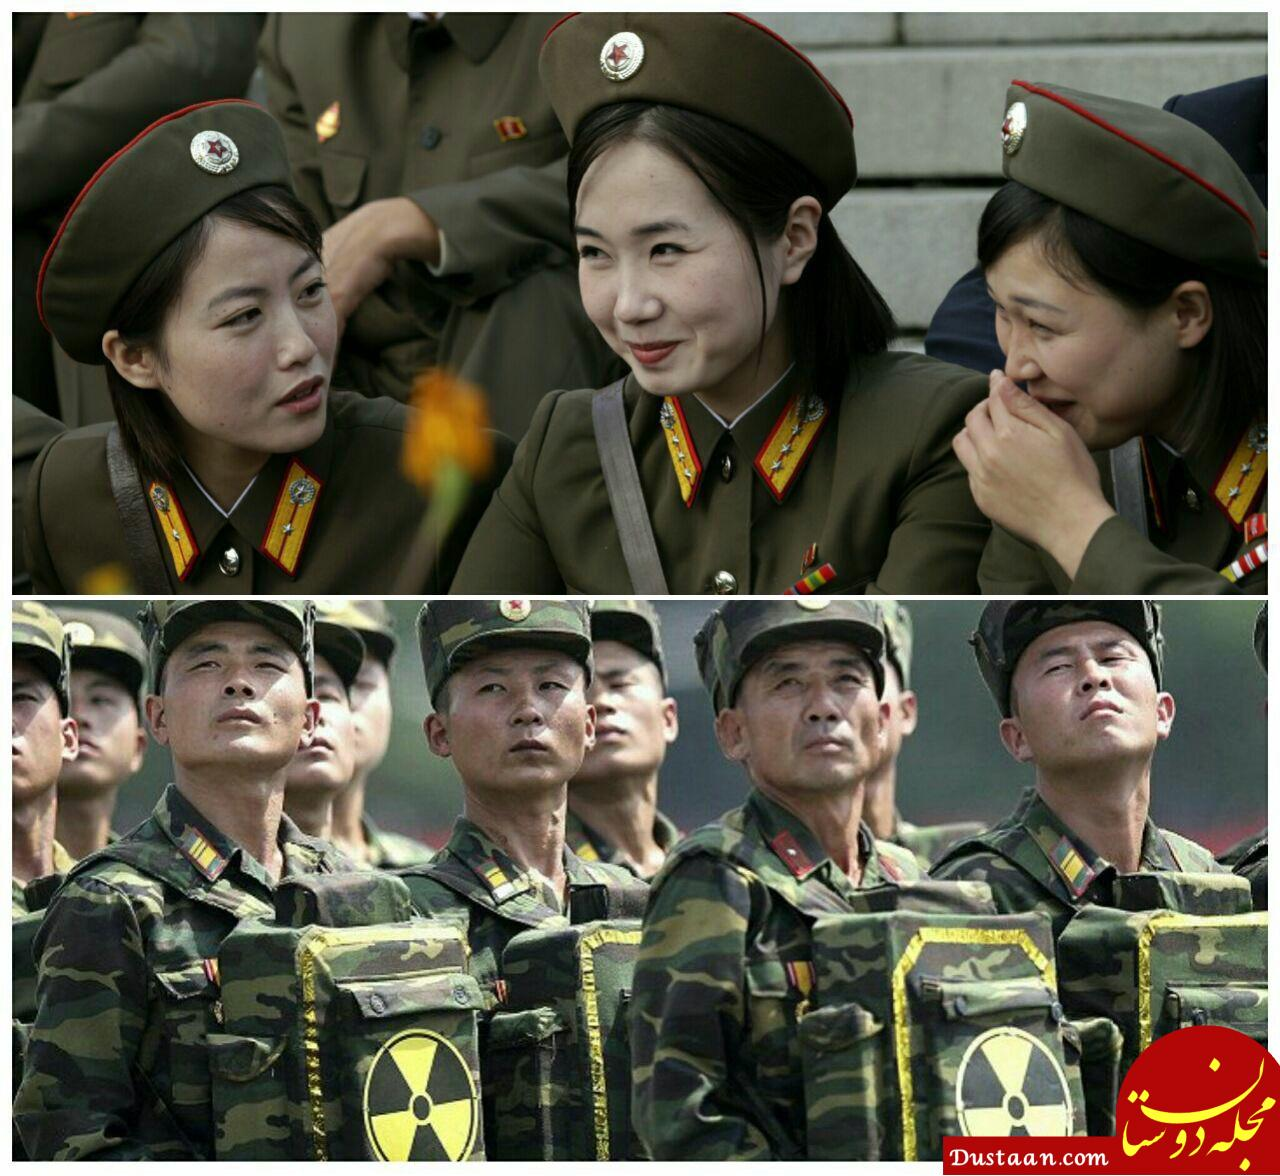 www.dustaan.com در این کشور دختر ها باید 7 سال به سربازی بروند! +عکس و فیلم